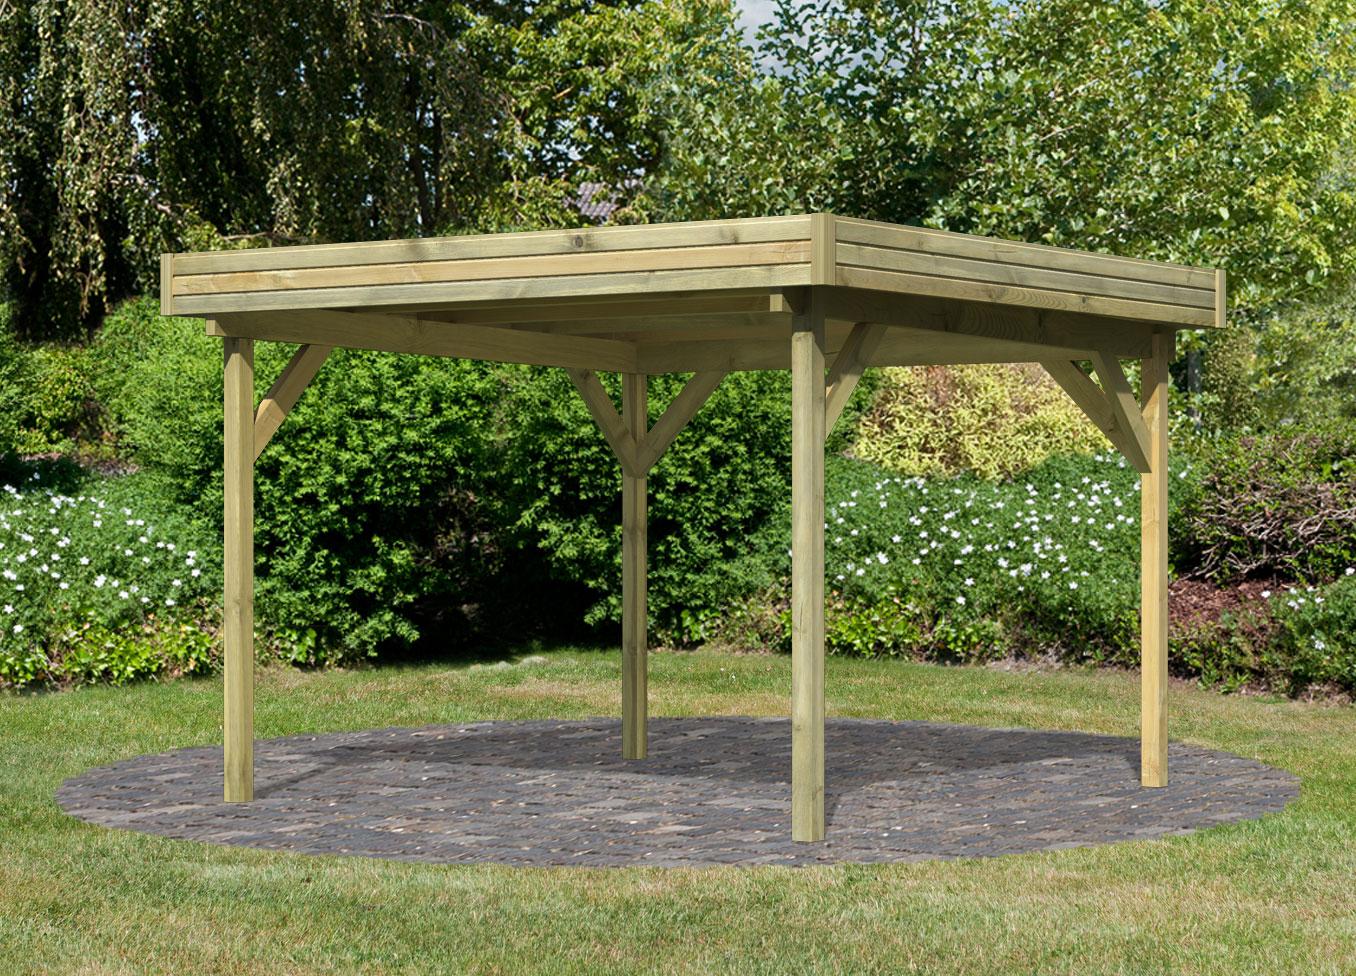 gartenpavillon selber bauen swalif. Black Bedroom Furniture Sets. Home Design Ideas